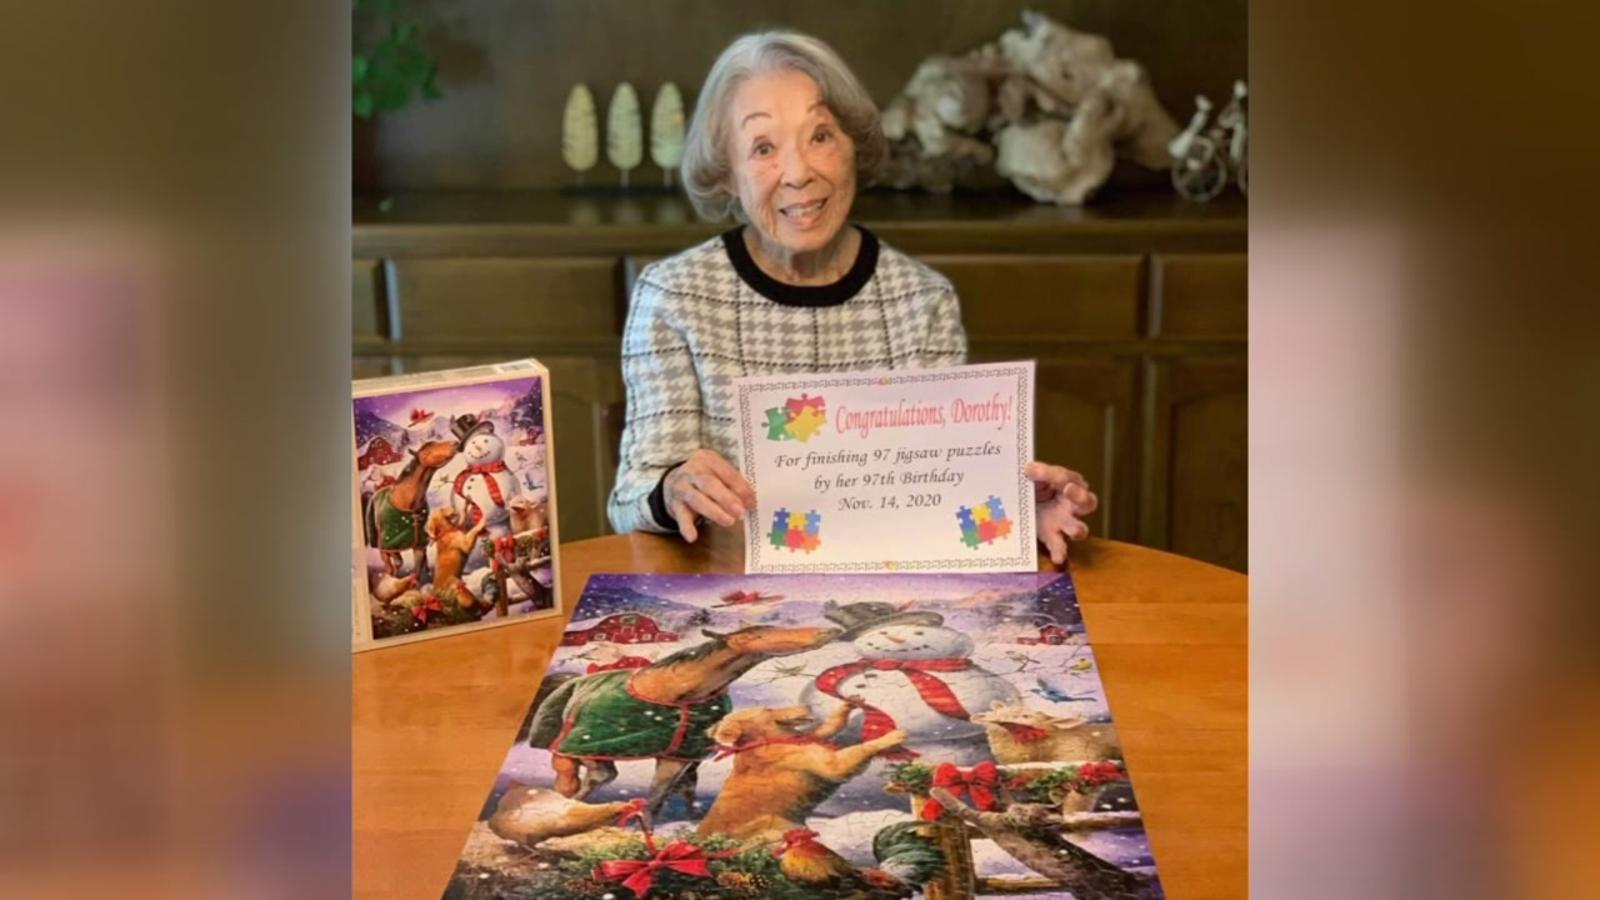 abc7news.com: Former South Bay opera singer Dorothy Hiura celebrates 97th birthday